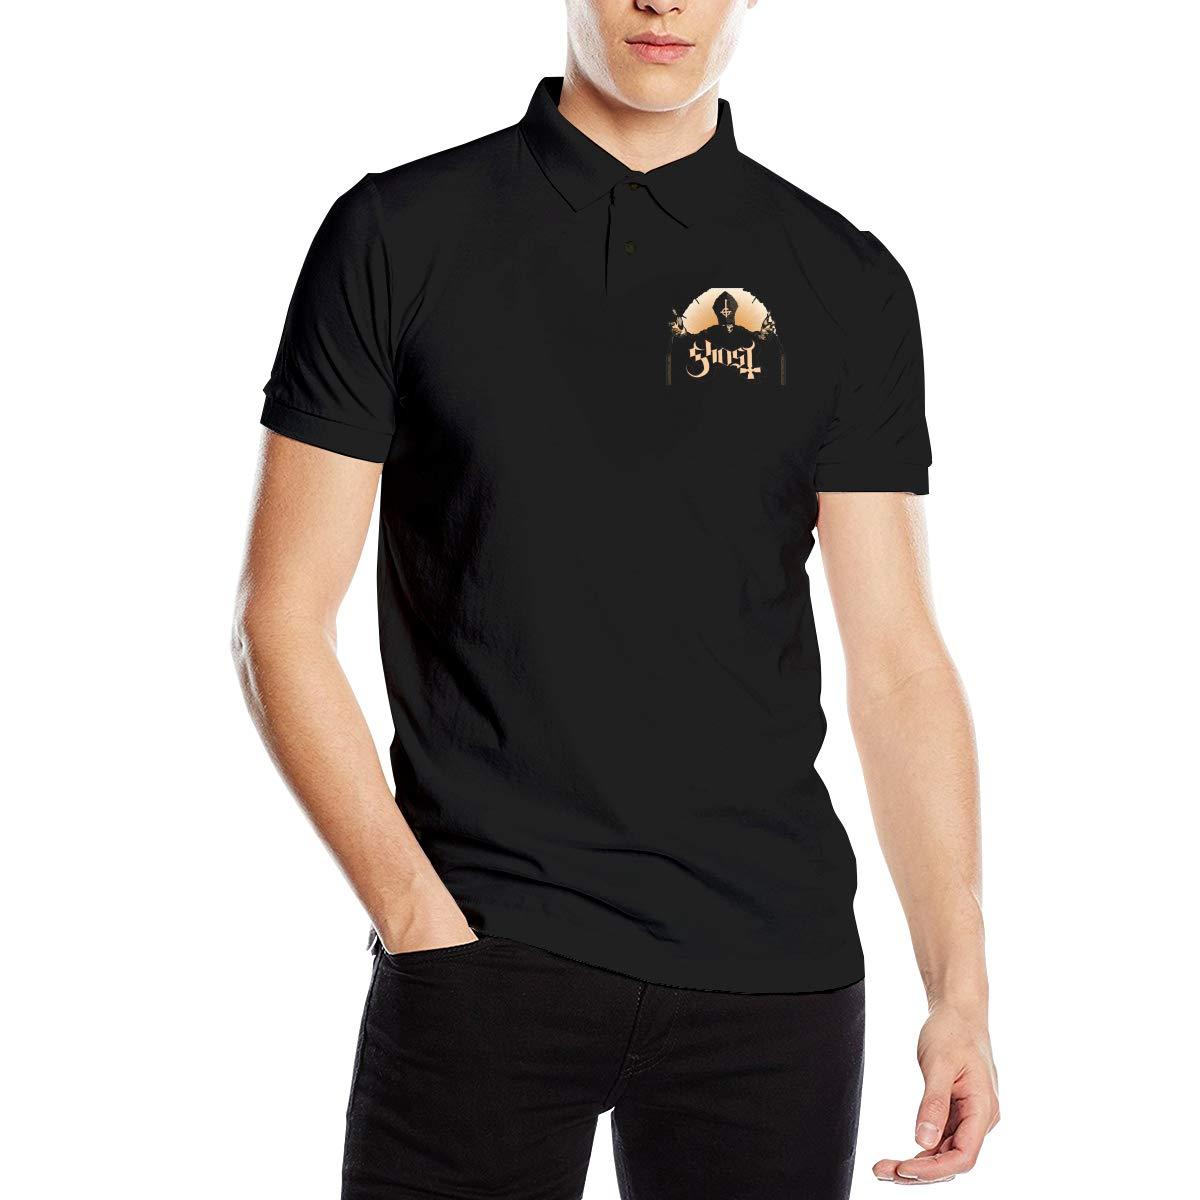 Cjlrqone Backstreetmerch Ghost Mens Funny Polo Shirts Black